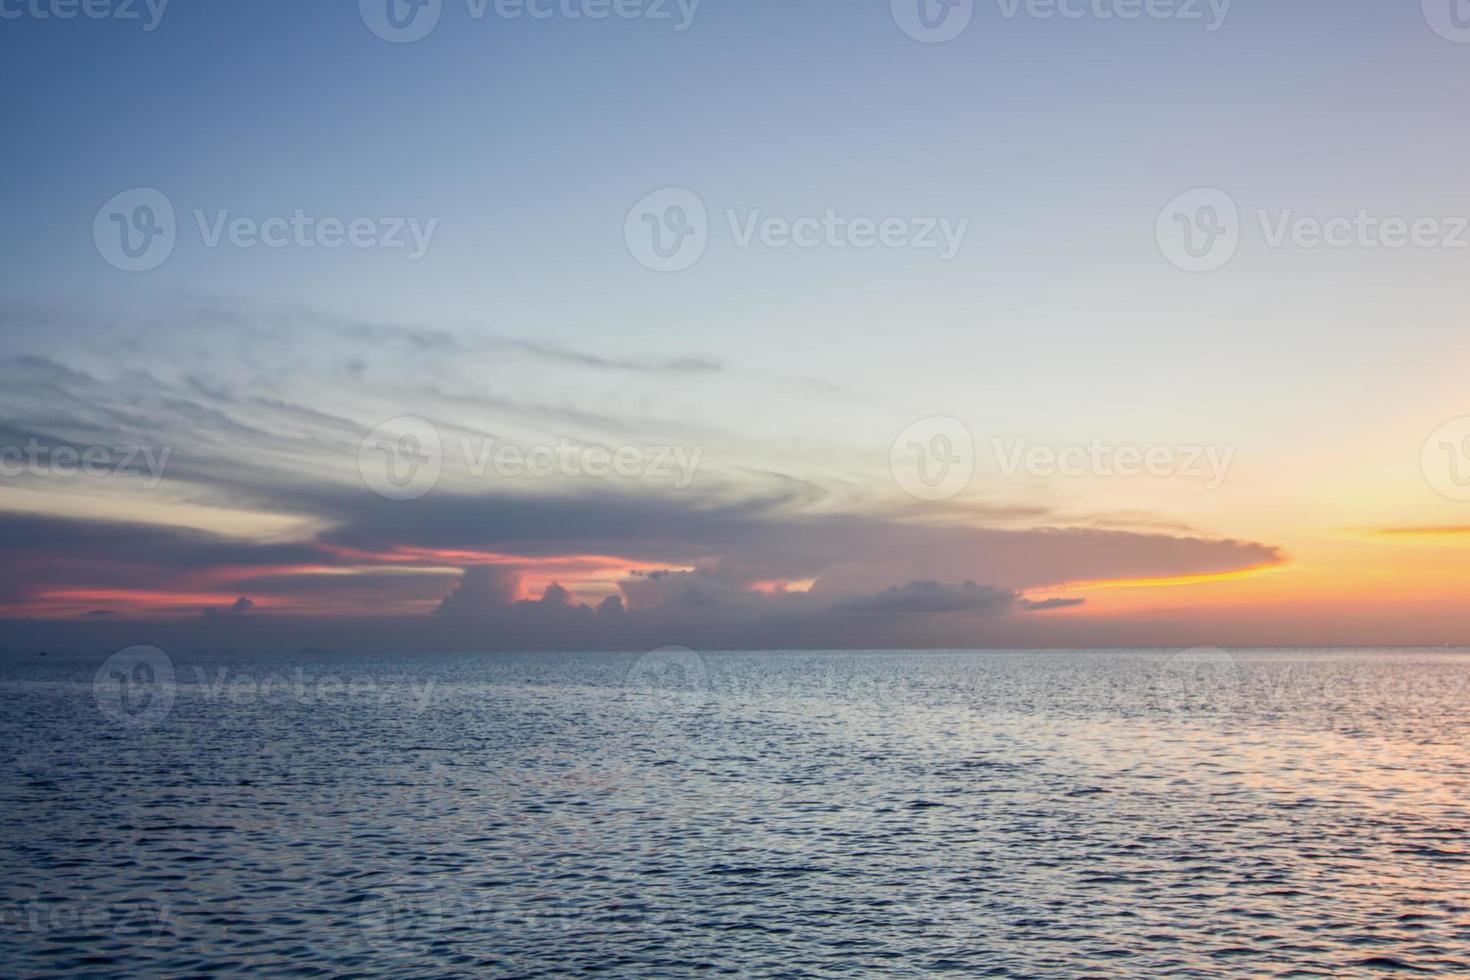 coucher de soleil en mer, koh phangan, surat thani, thaïlande photo